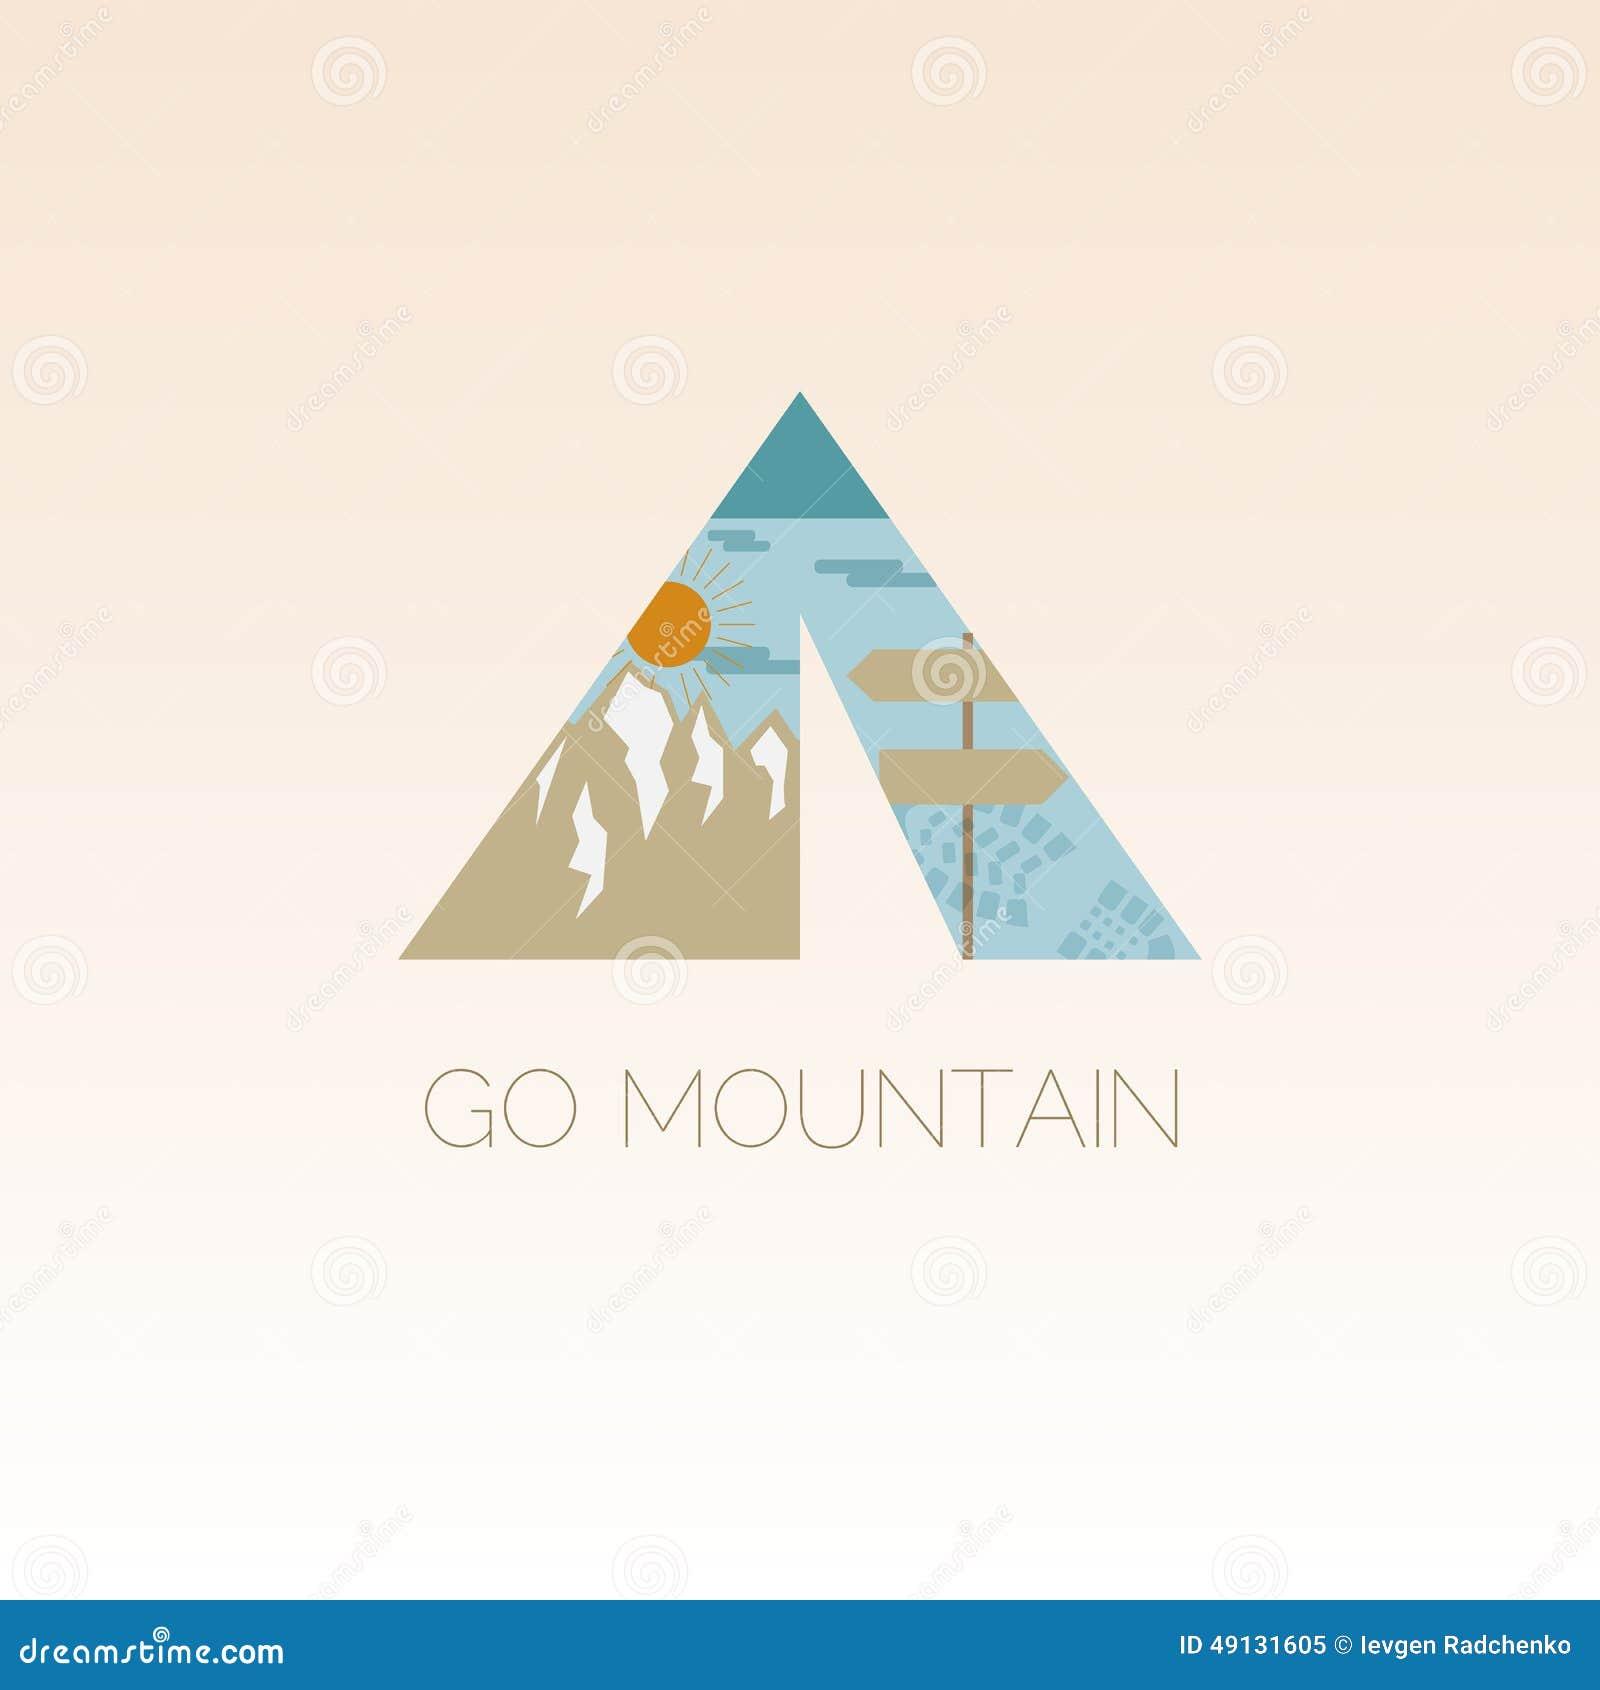 Mountain Camp Logo Design Template Stock Vector Illustration Of